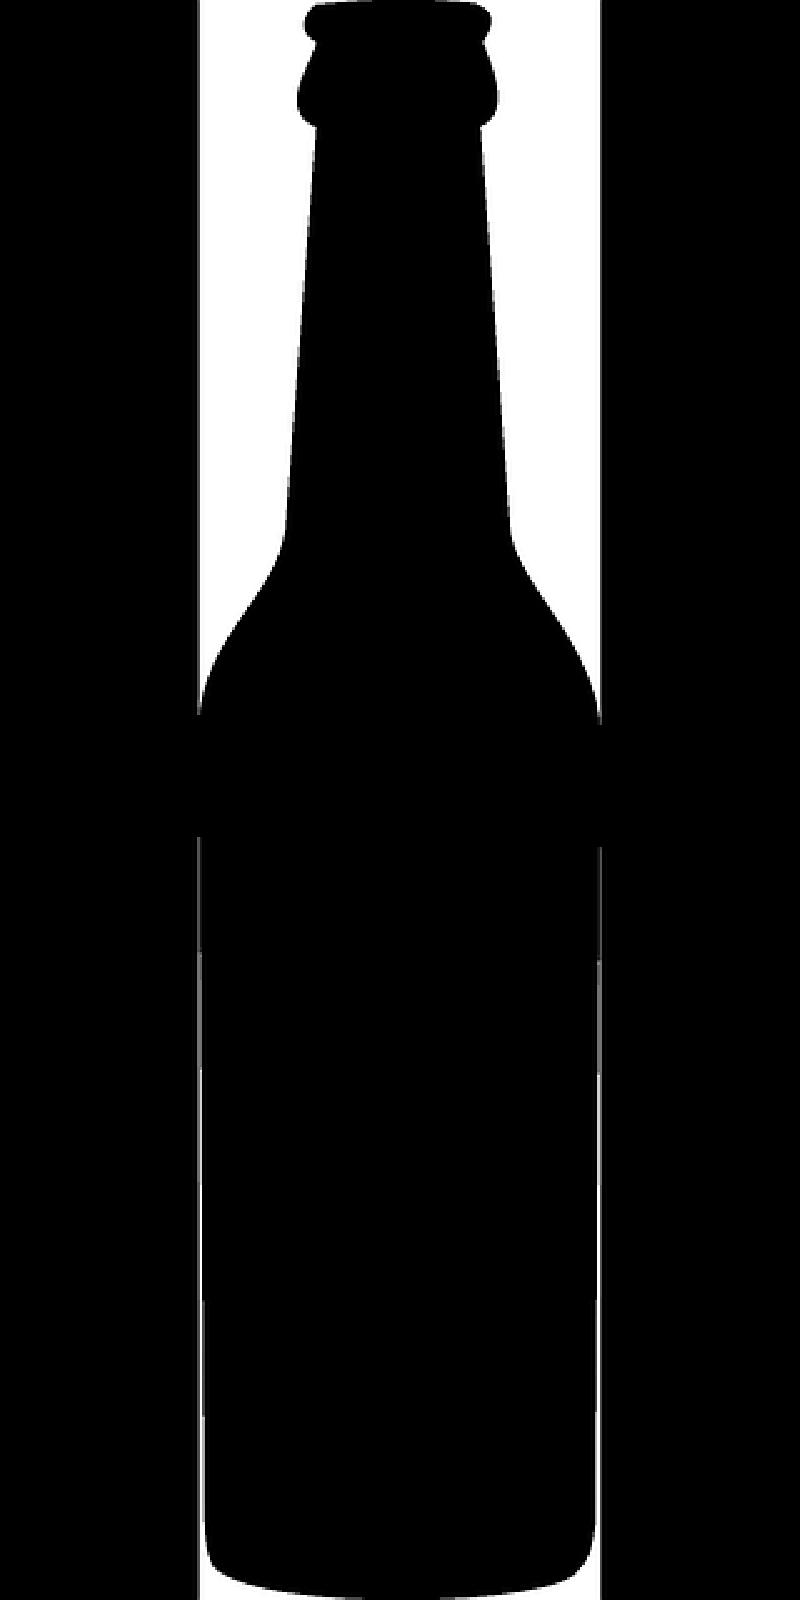 Silhouette Beer Bottle Clipart.